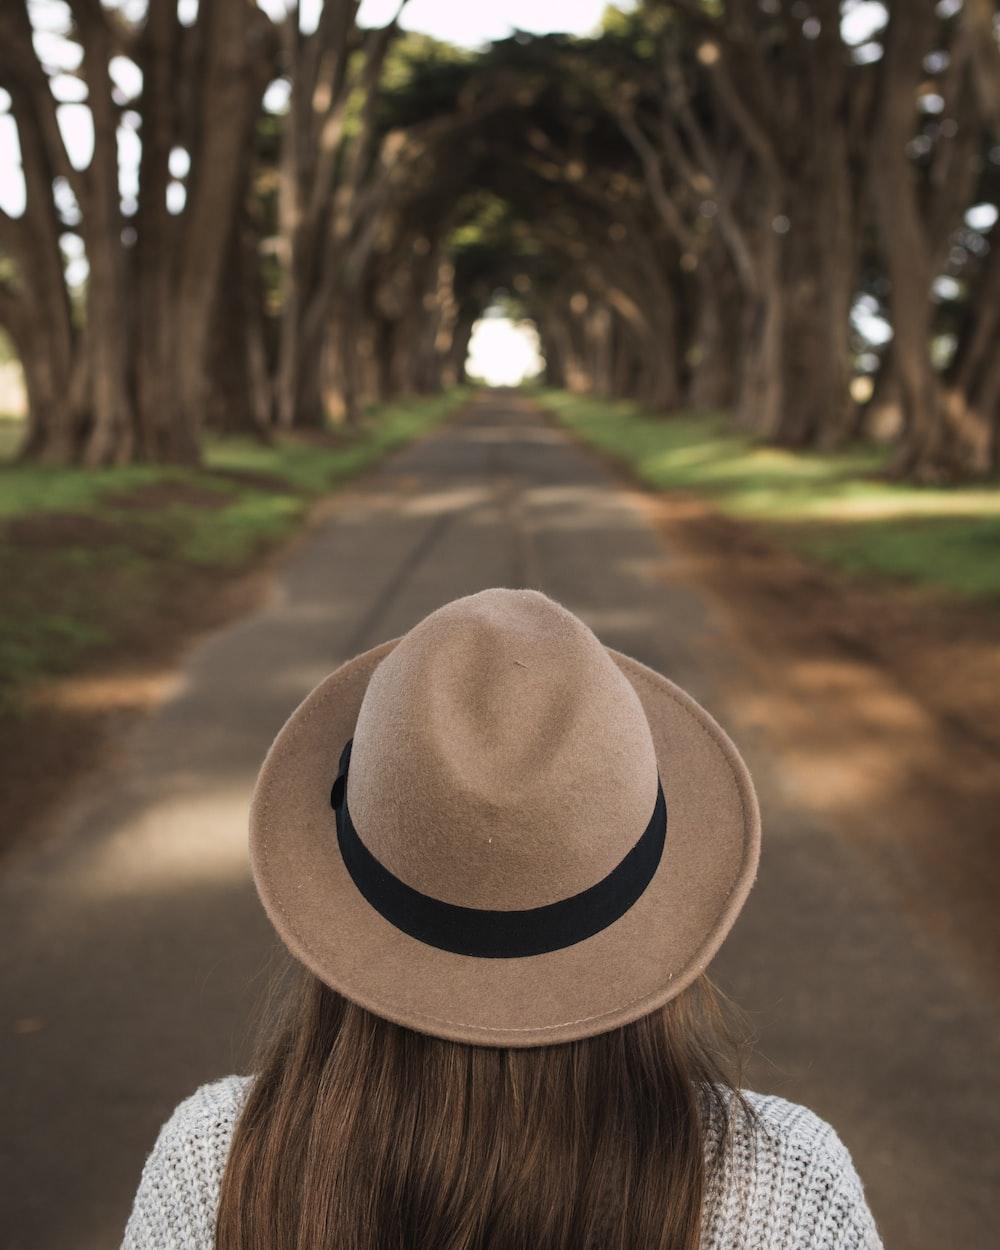 woman walking on road between trees during daytime